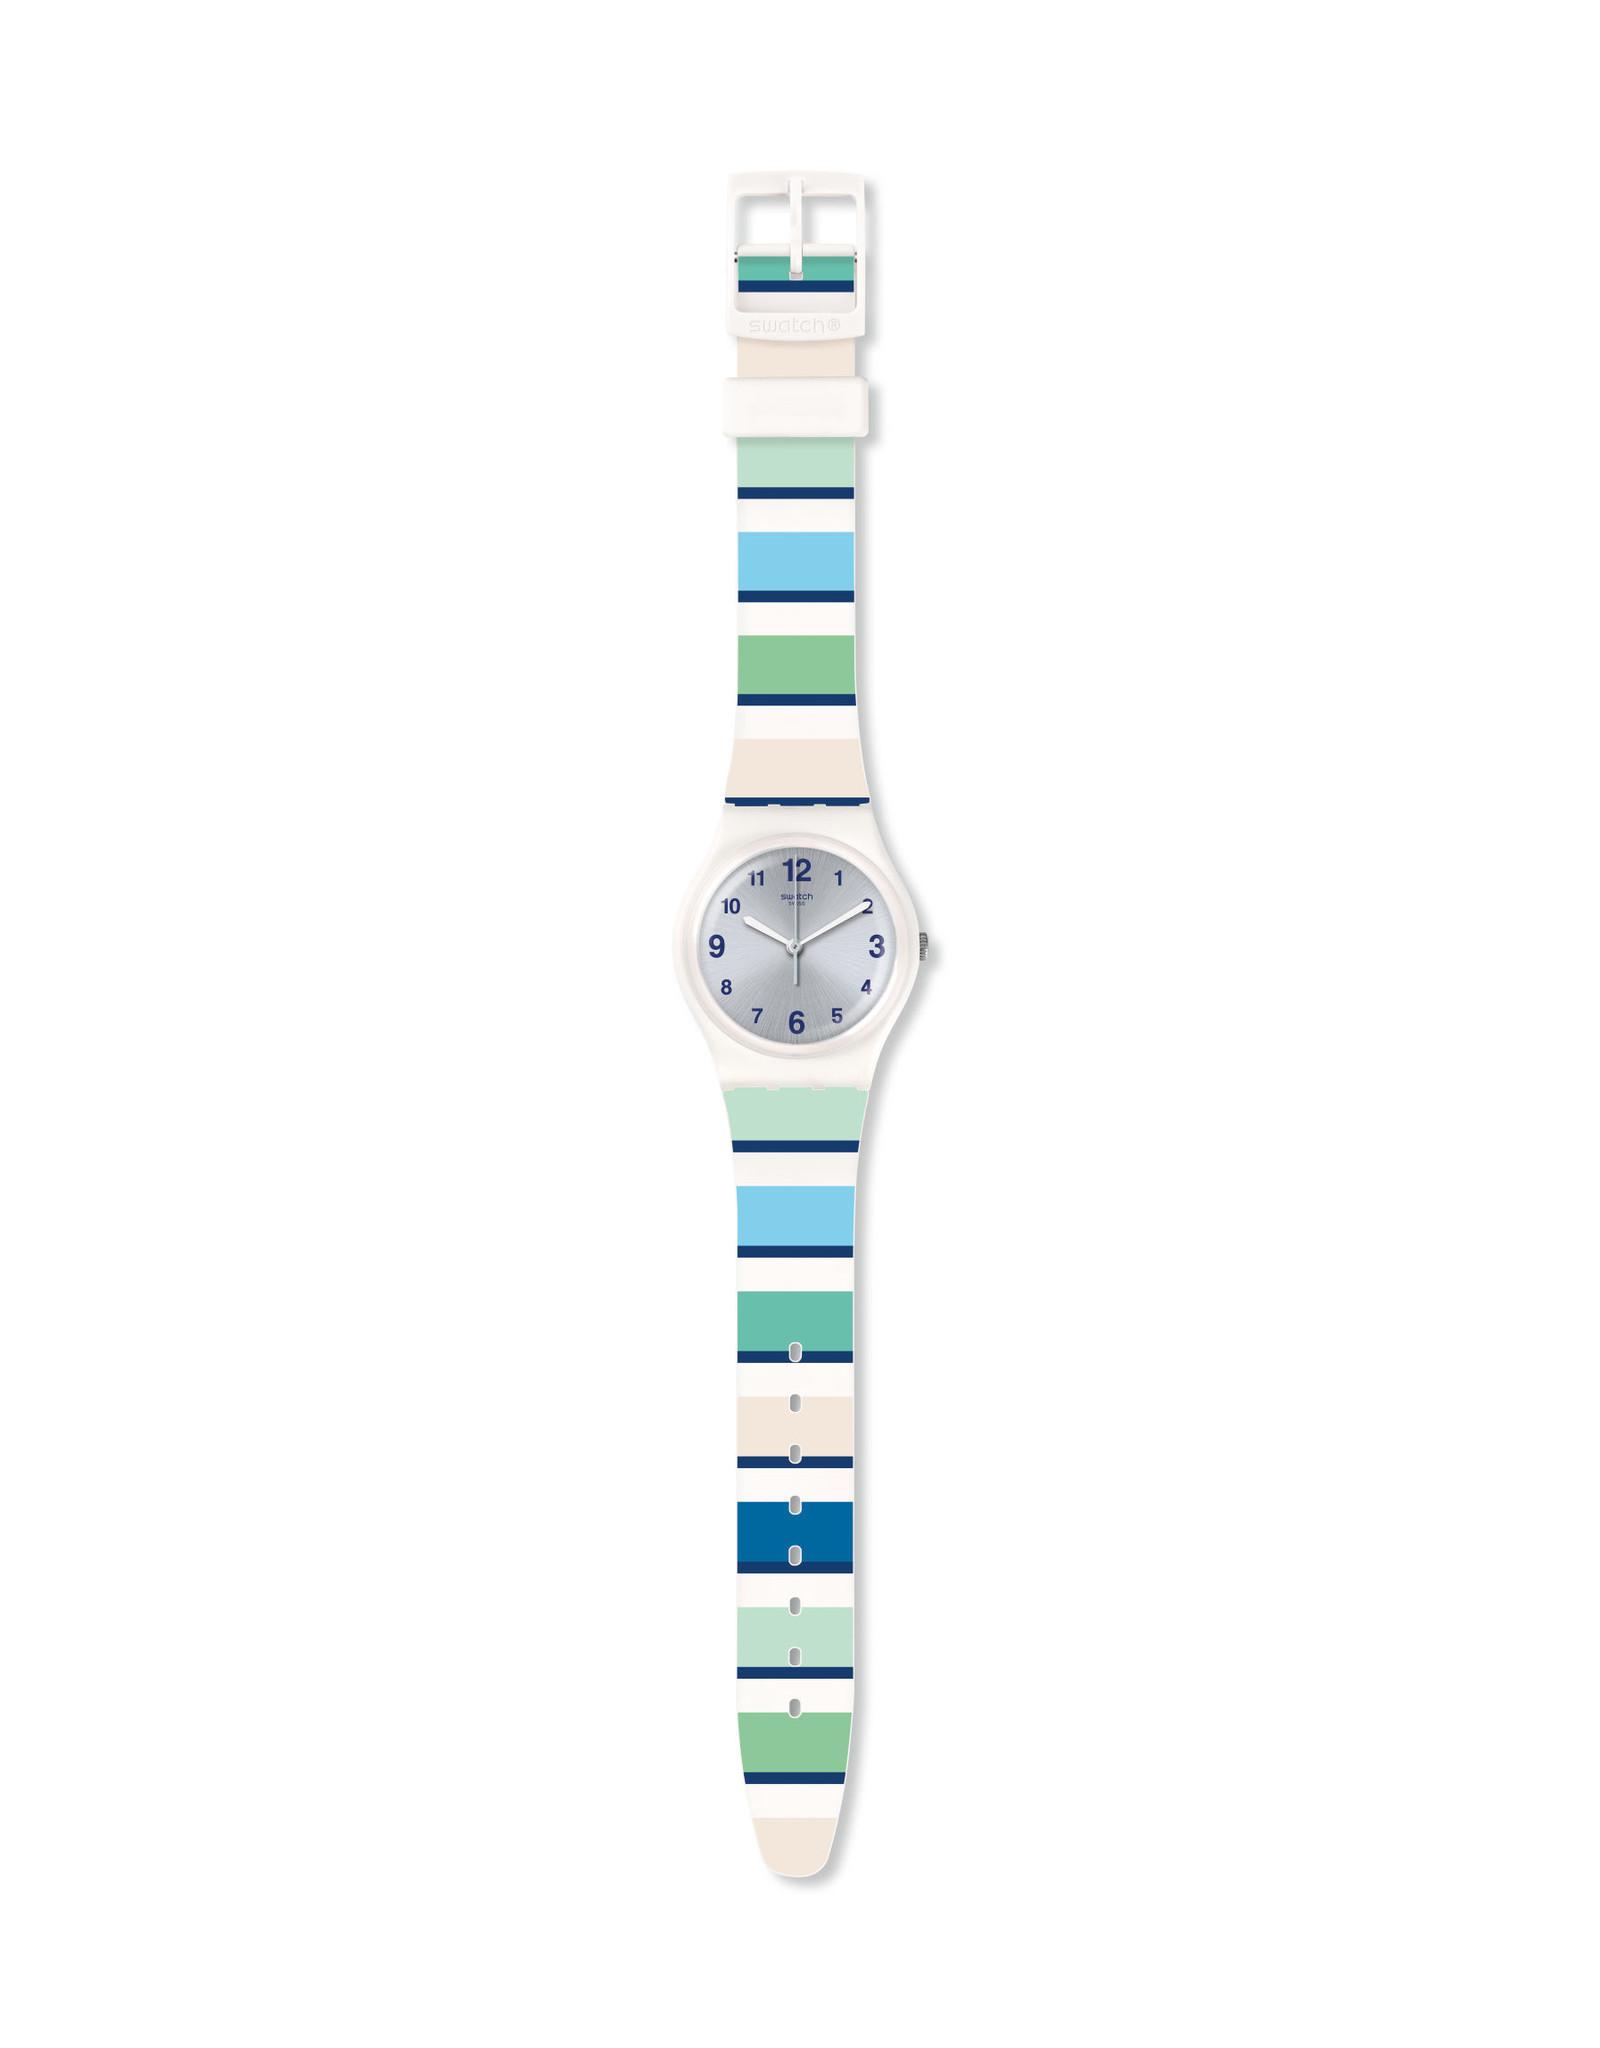 Swatch Swatch GW189 MARINAI